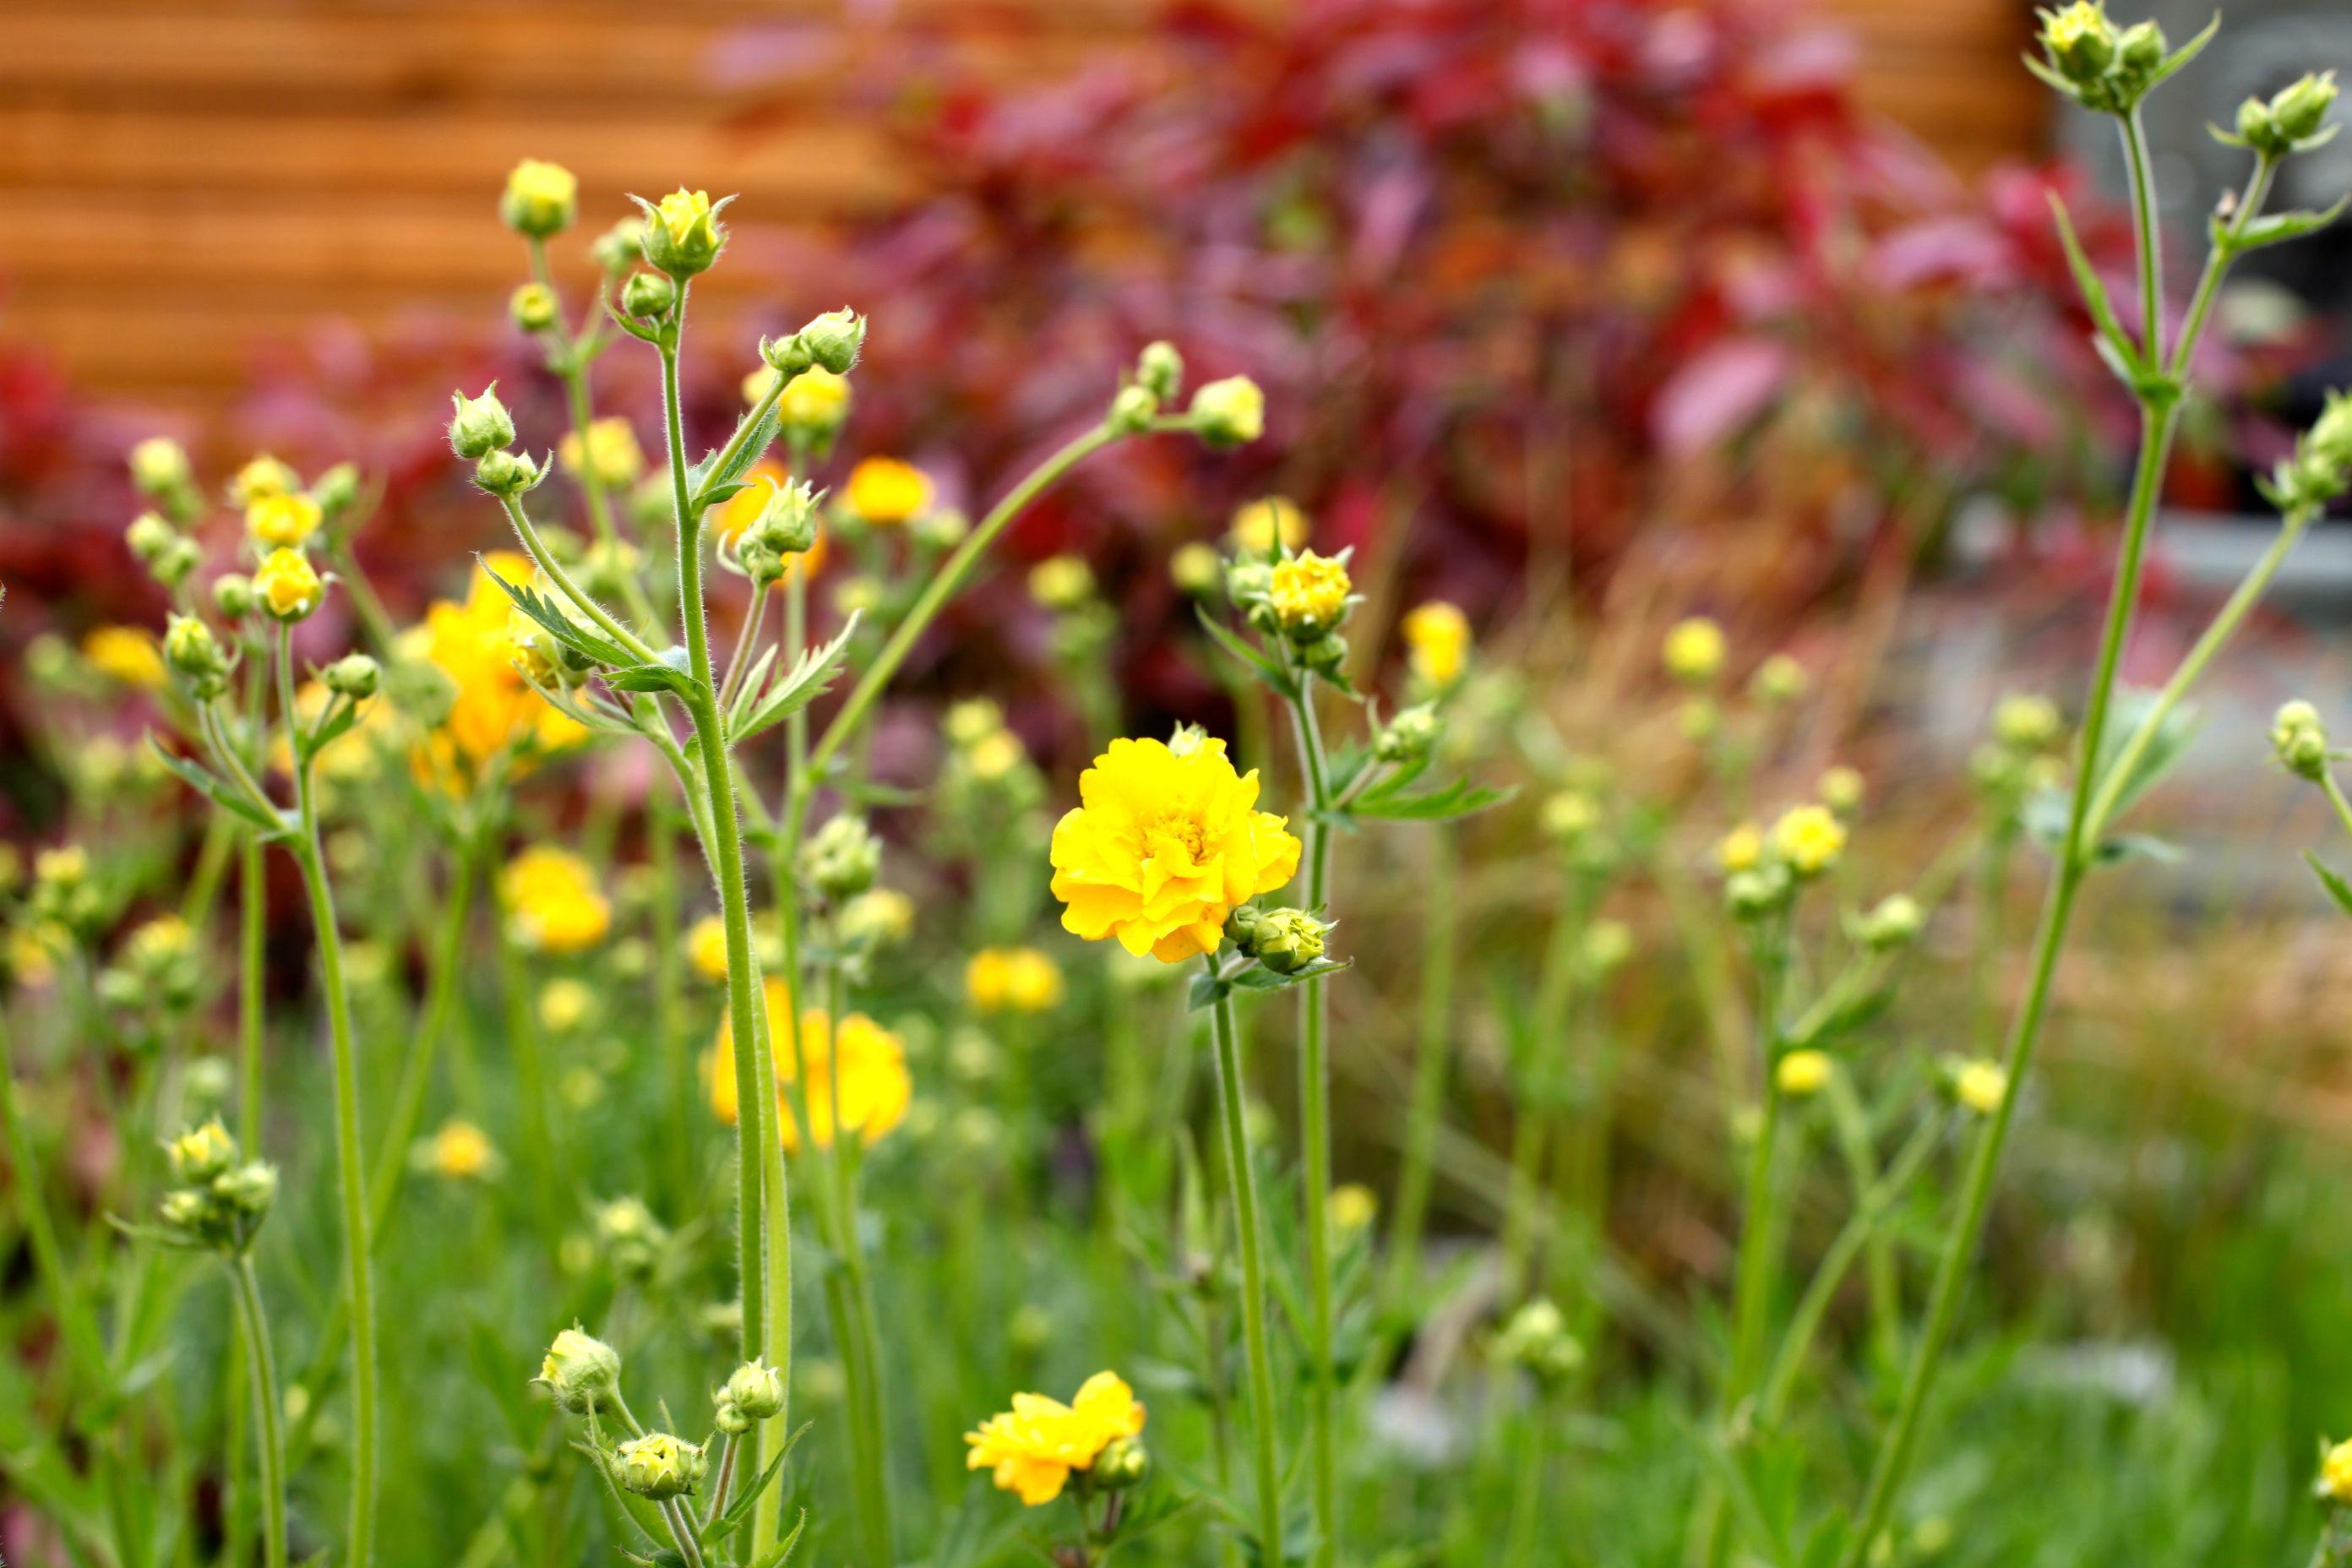 Geum chiloense lady stratheden yellow flowers may sept comes geum chiloense lady stratheden yellow flowers may sept comes back every mightylinksfo